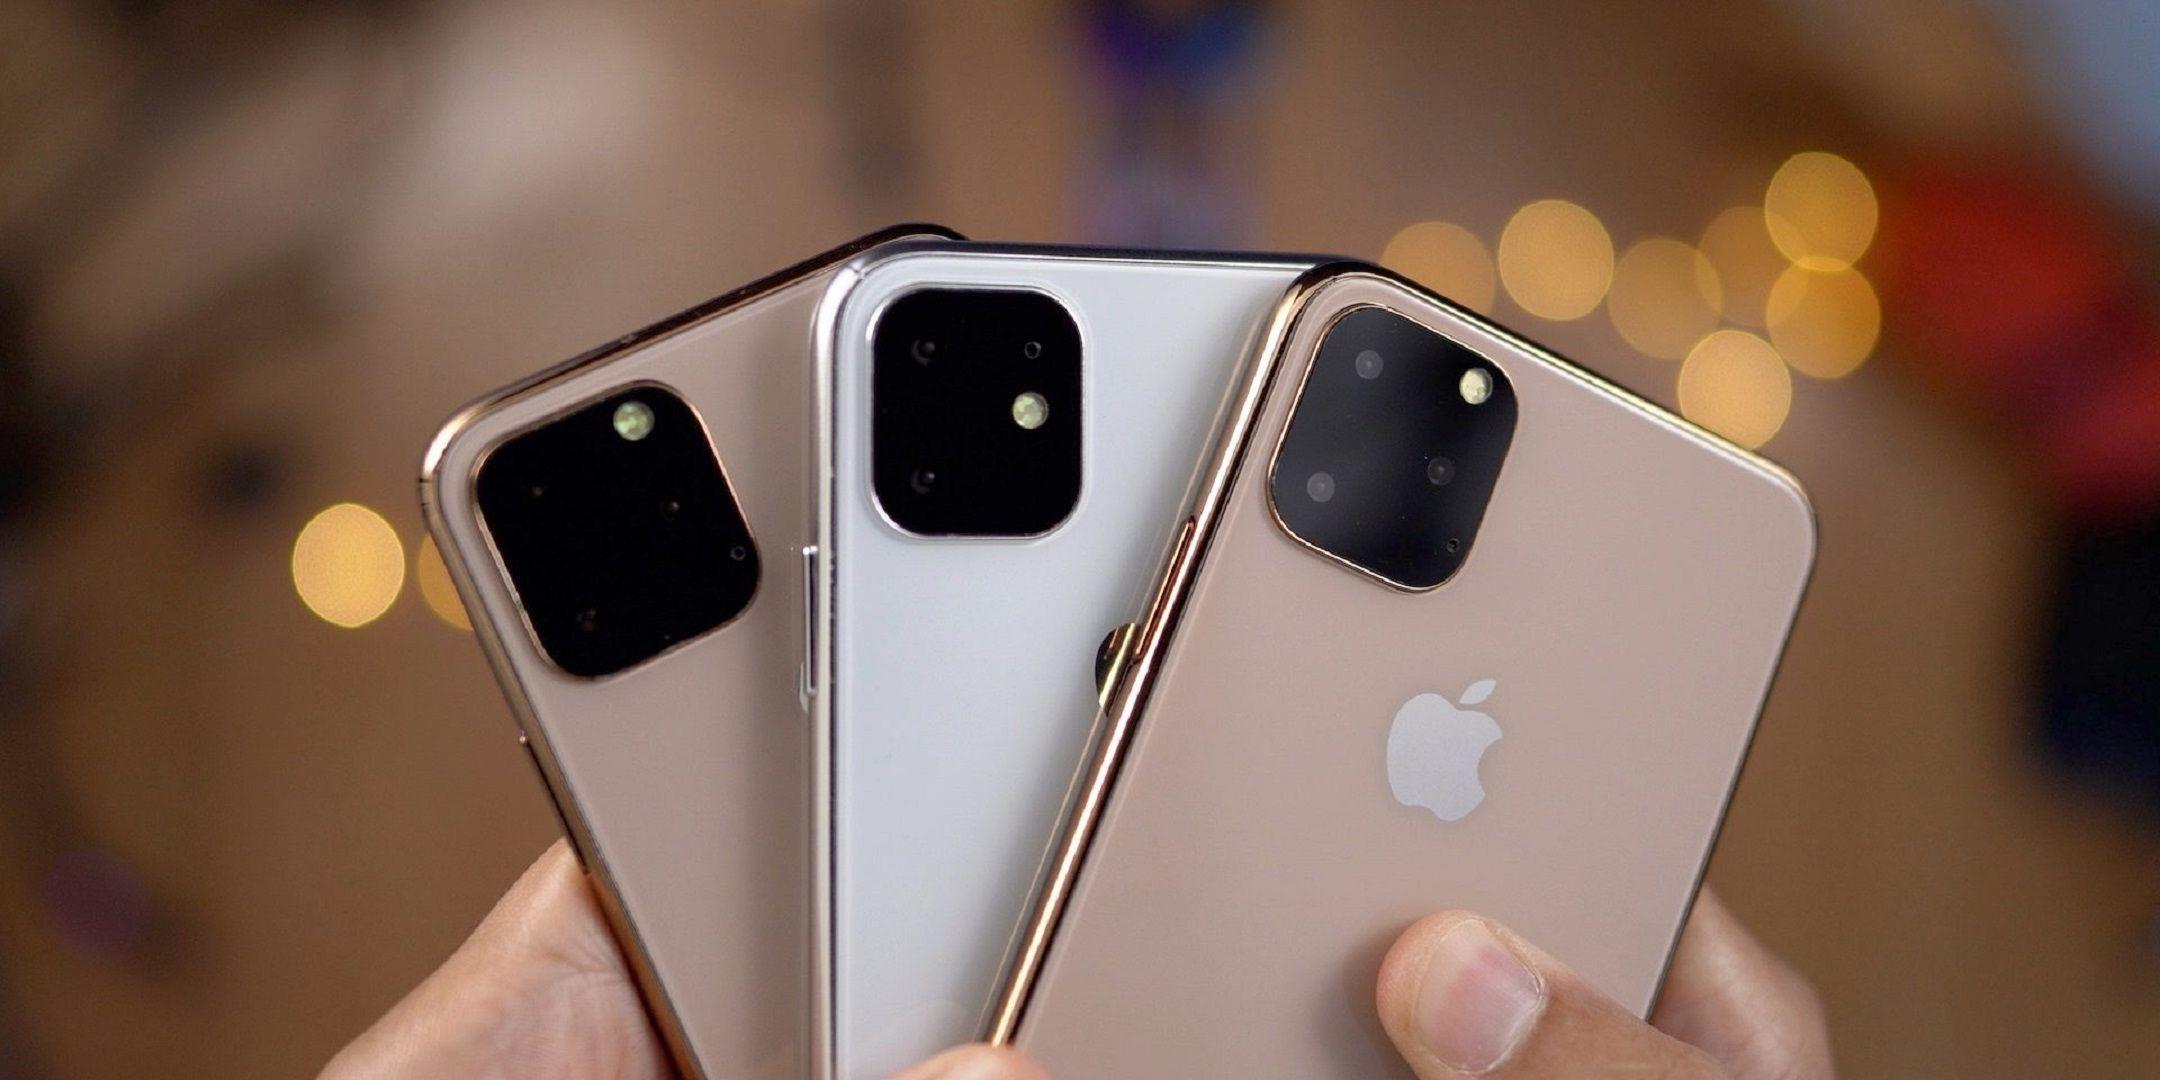 دليل جديد في Ios 13 يكشف عن موعد الإعلان عن هواتف Iphone 11 Iphone Three Iphone Iphone 11